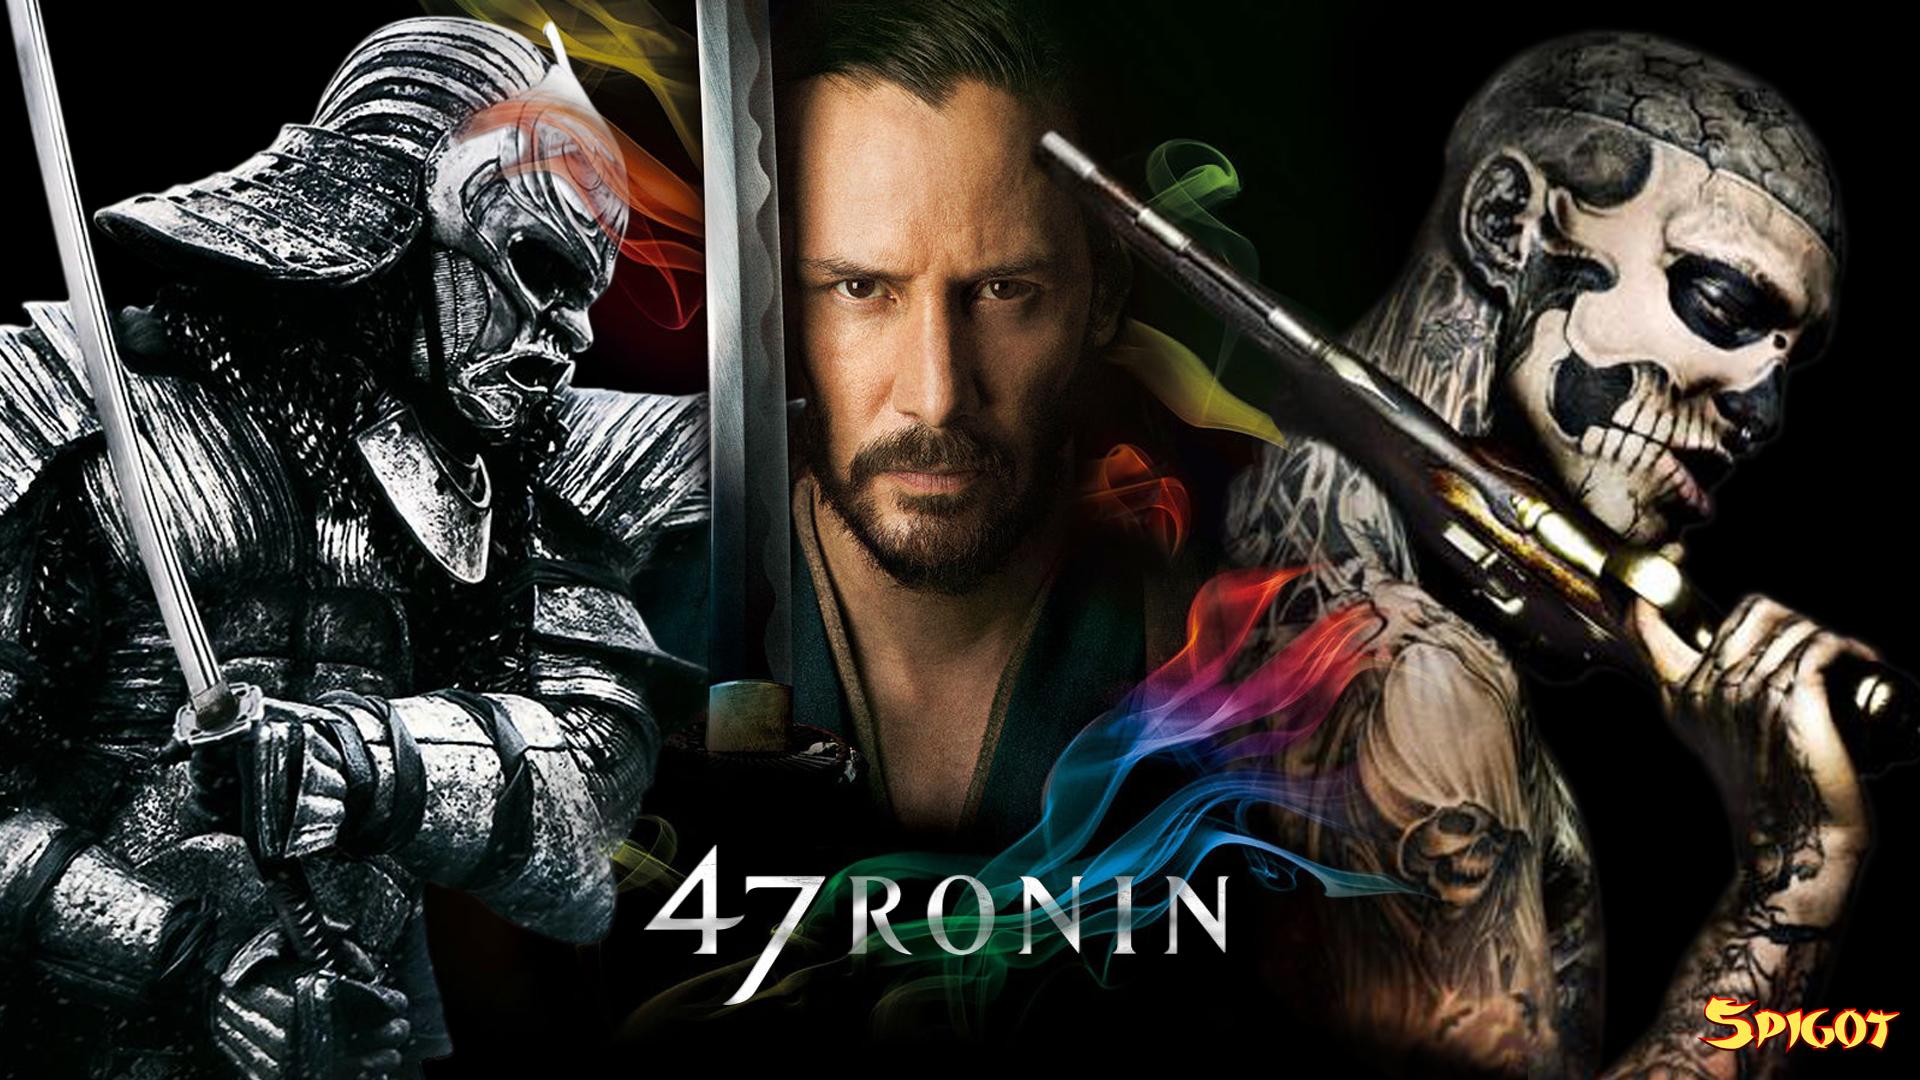 47 Ronin (2013) HD